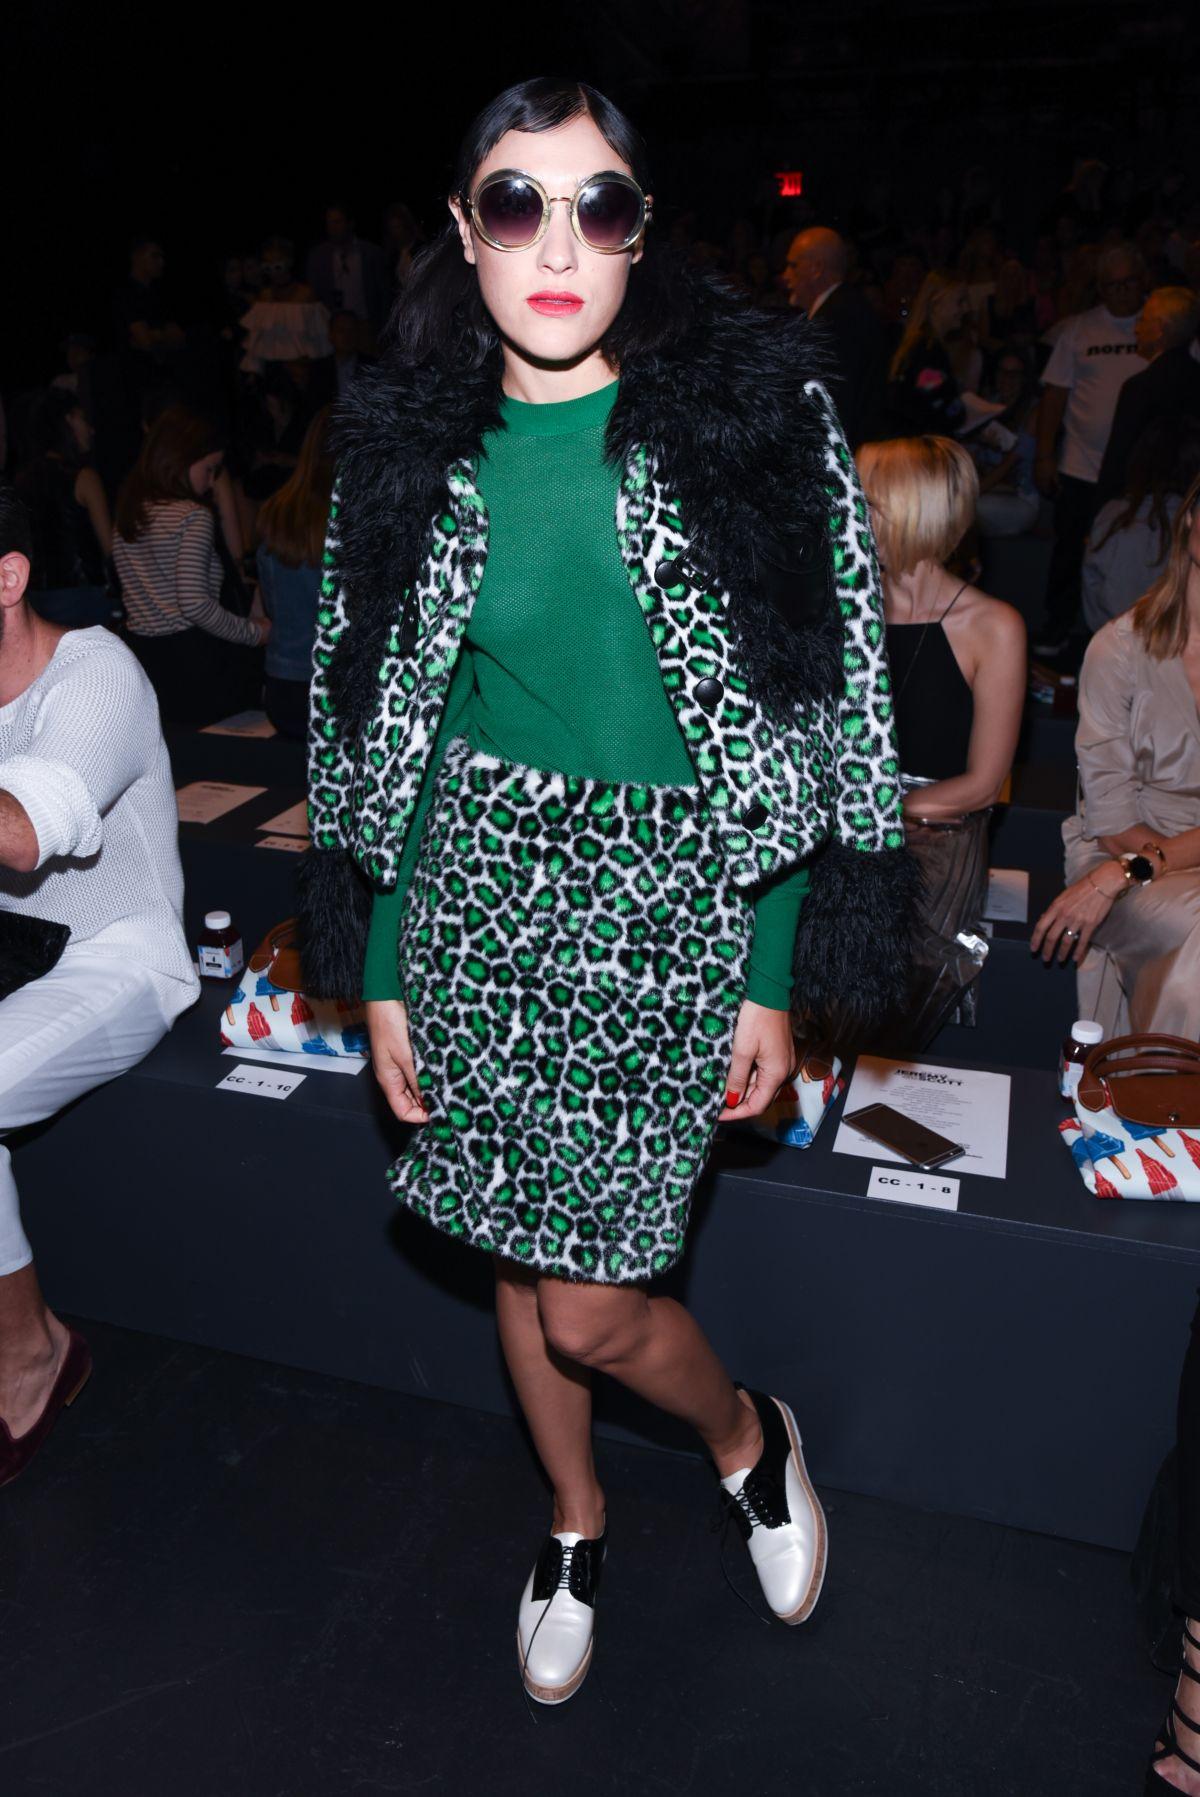 Fashion Mia Online Customer Reviews: MIA MORETTI At Jeremy Scott Fashion Show At New York